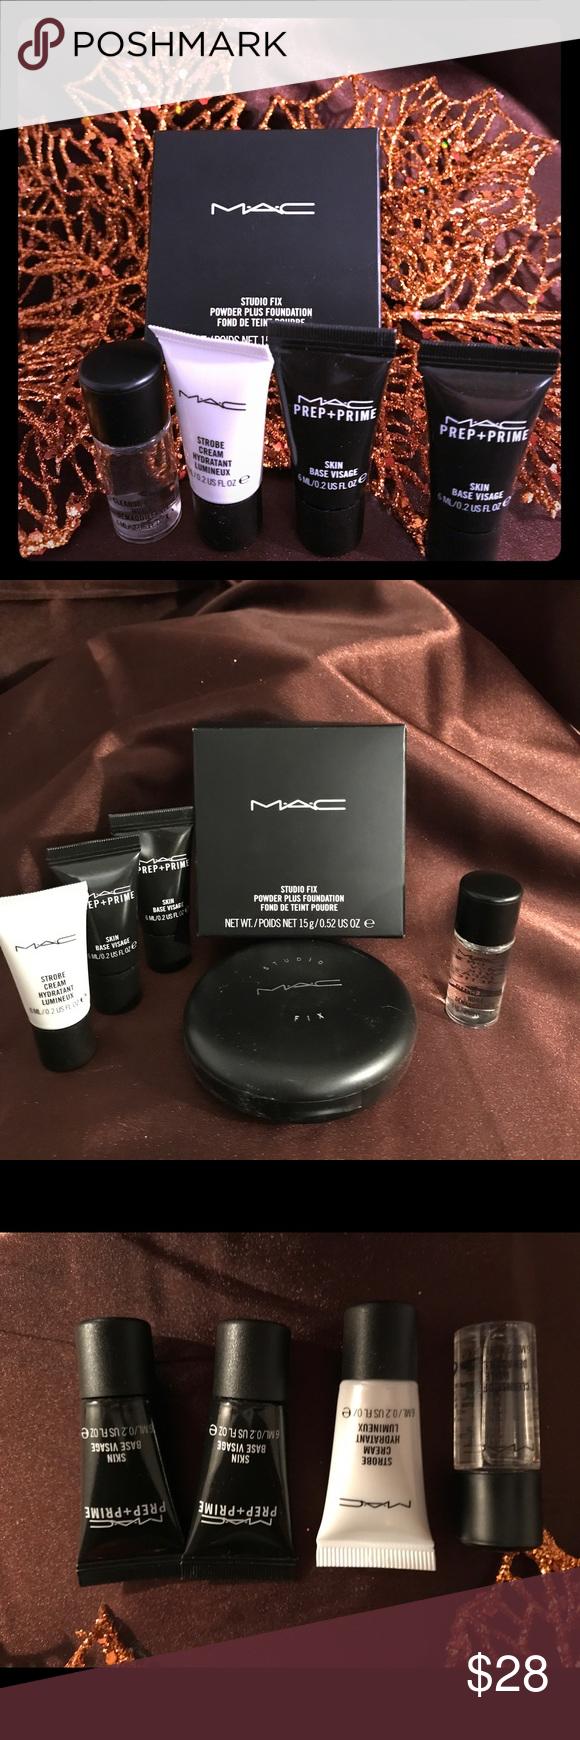 MAC studio fix powder plus foundation 👸🏼🤳🏻 Full size MAC